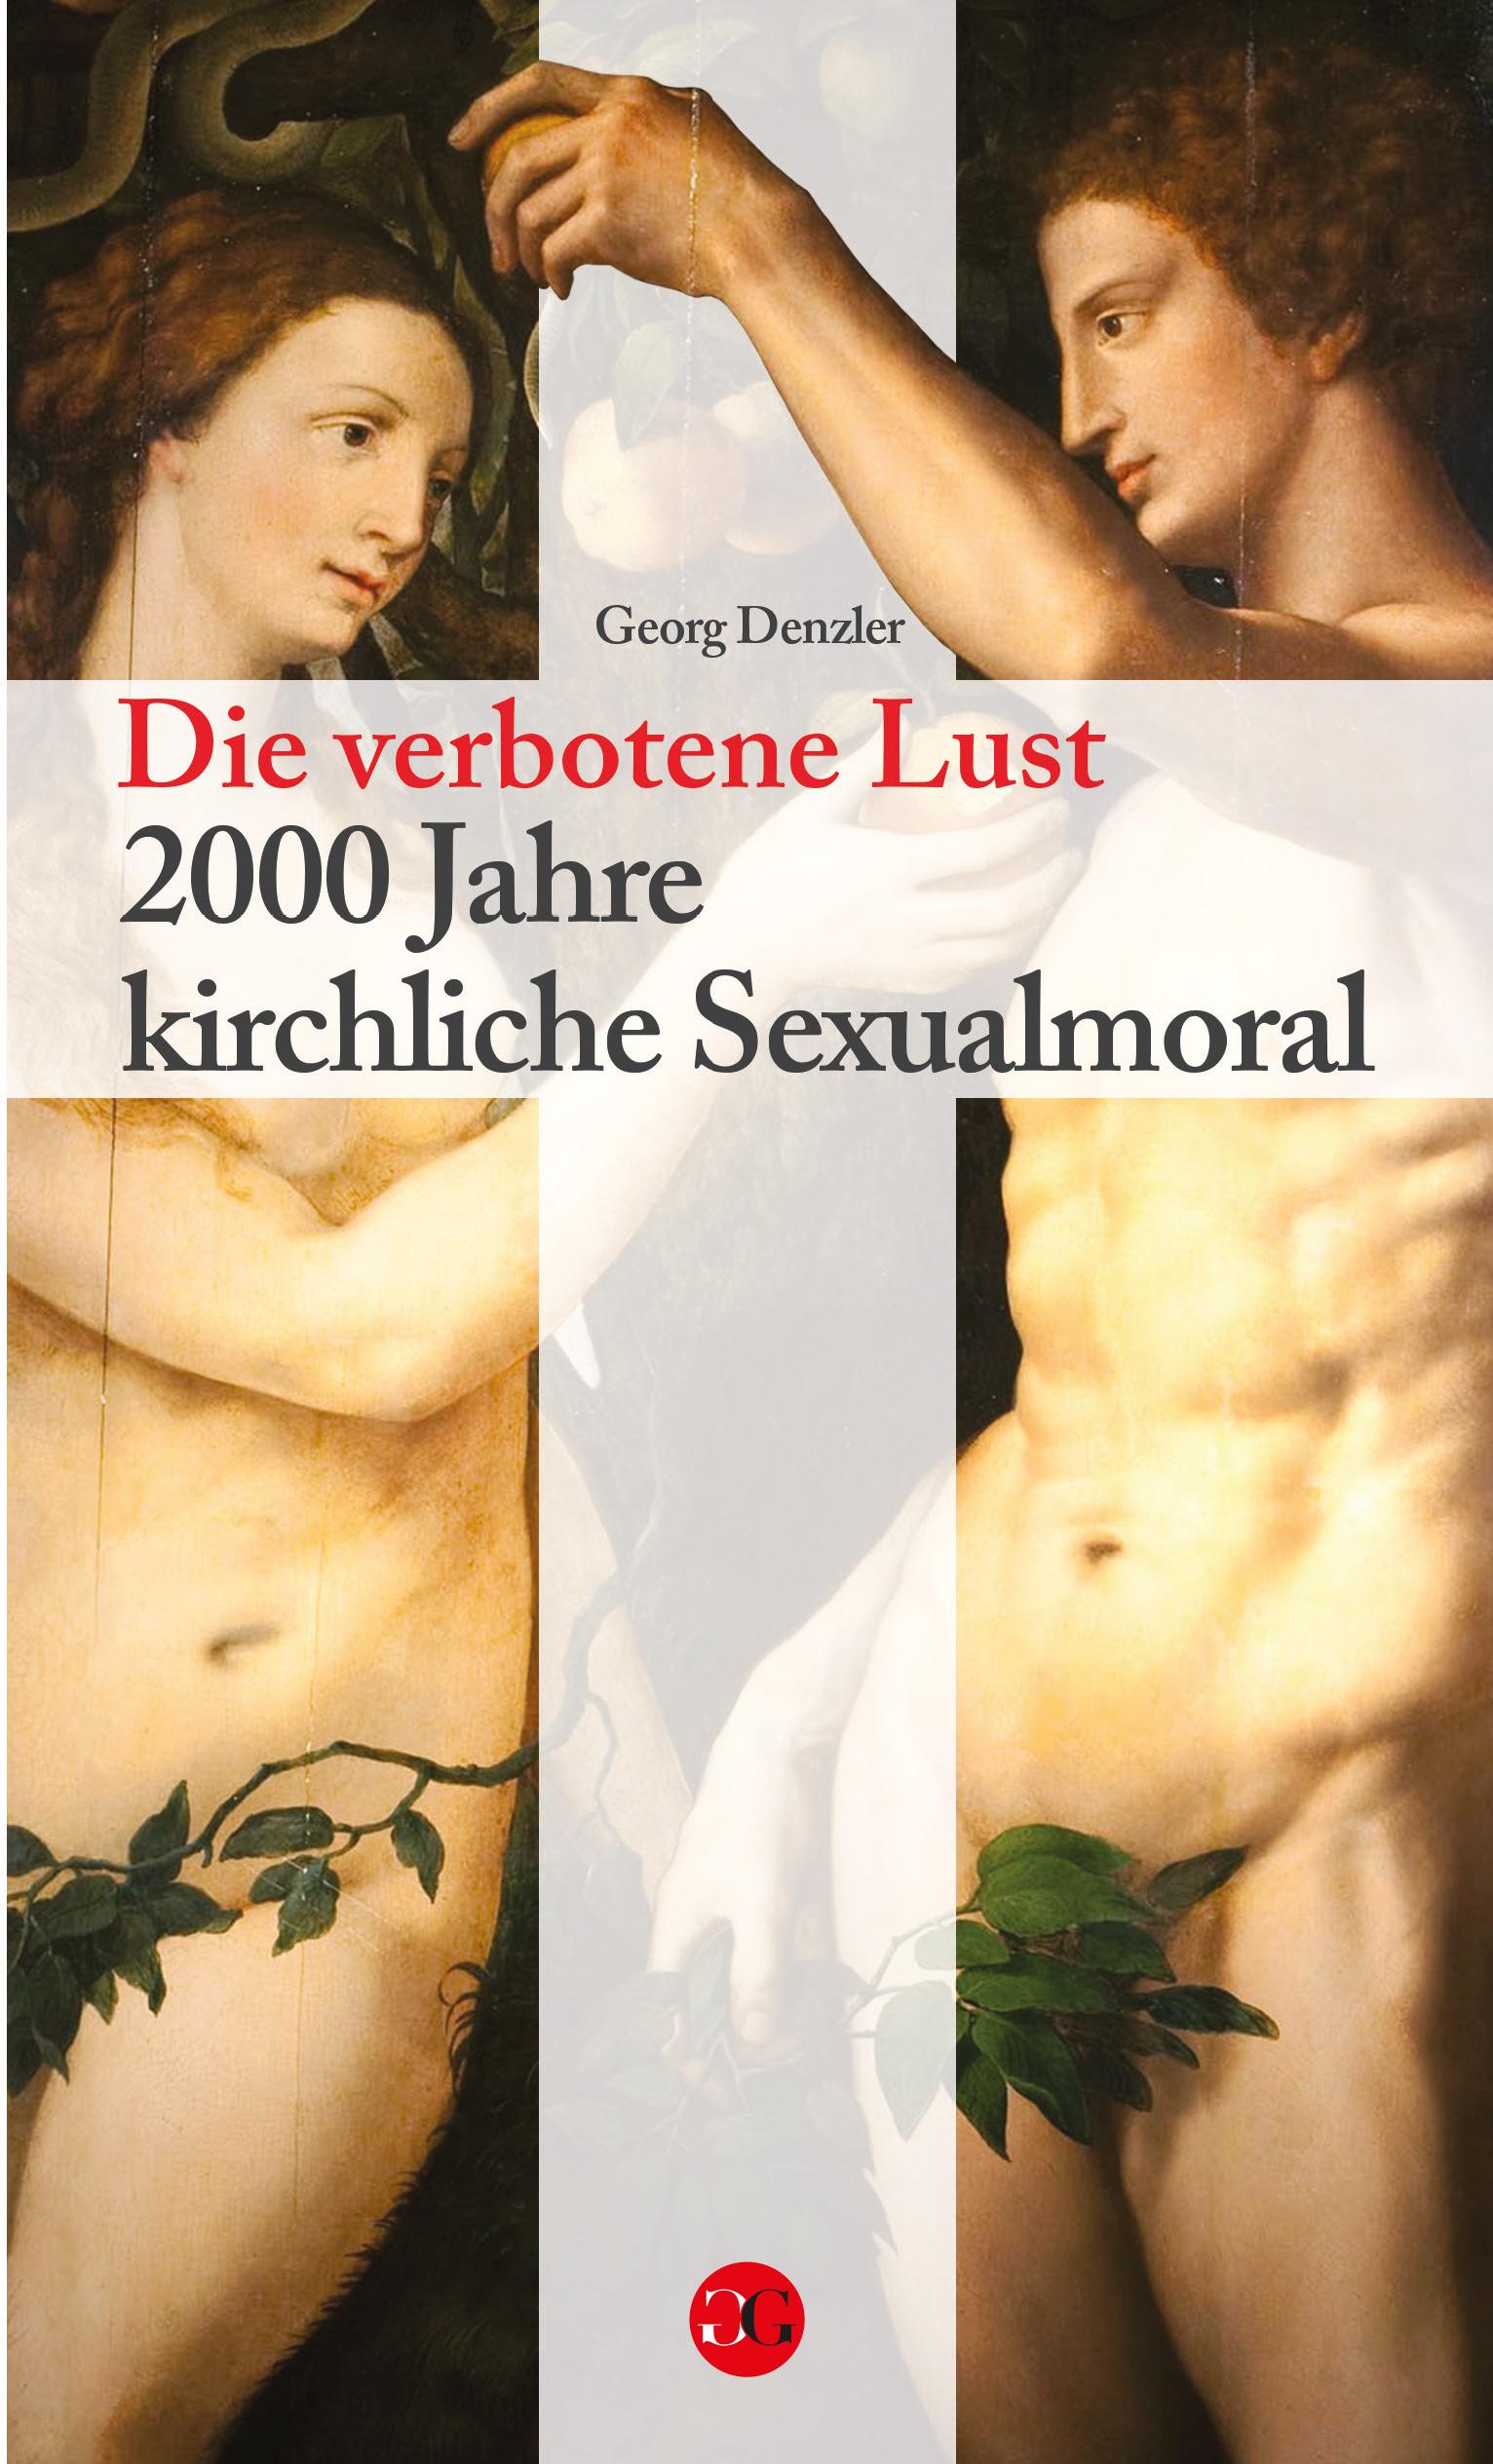 Georg Denzler Die verbotene Lust